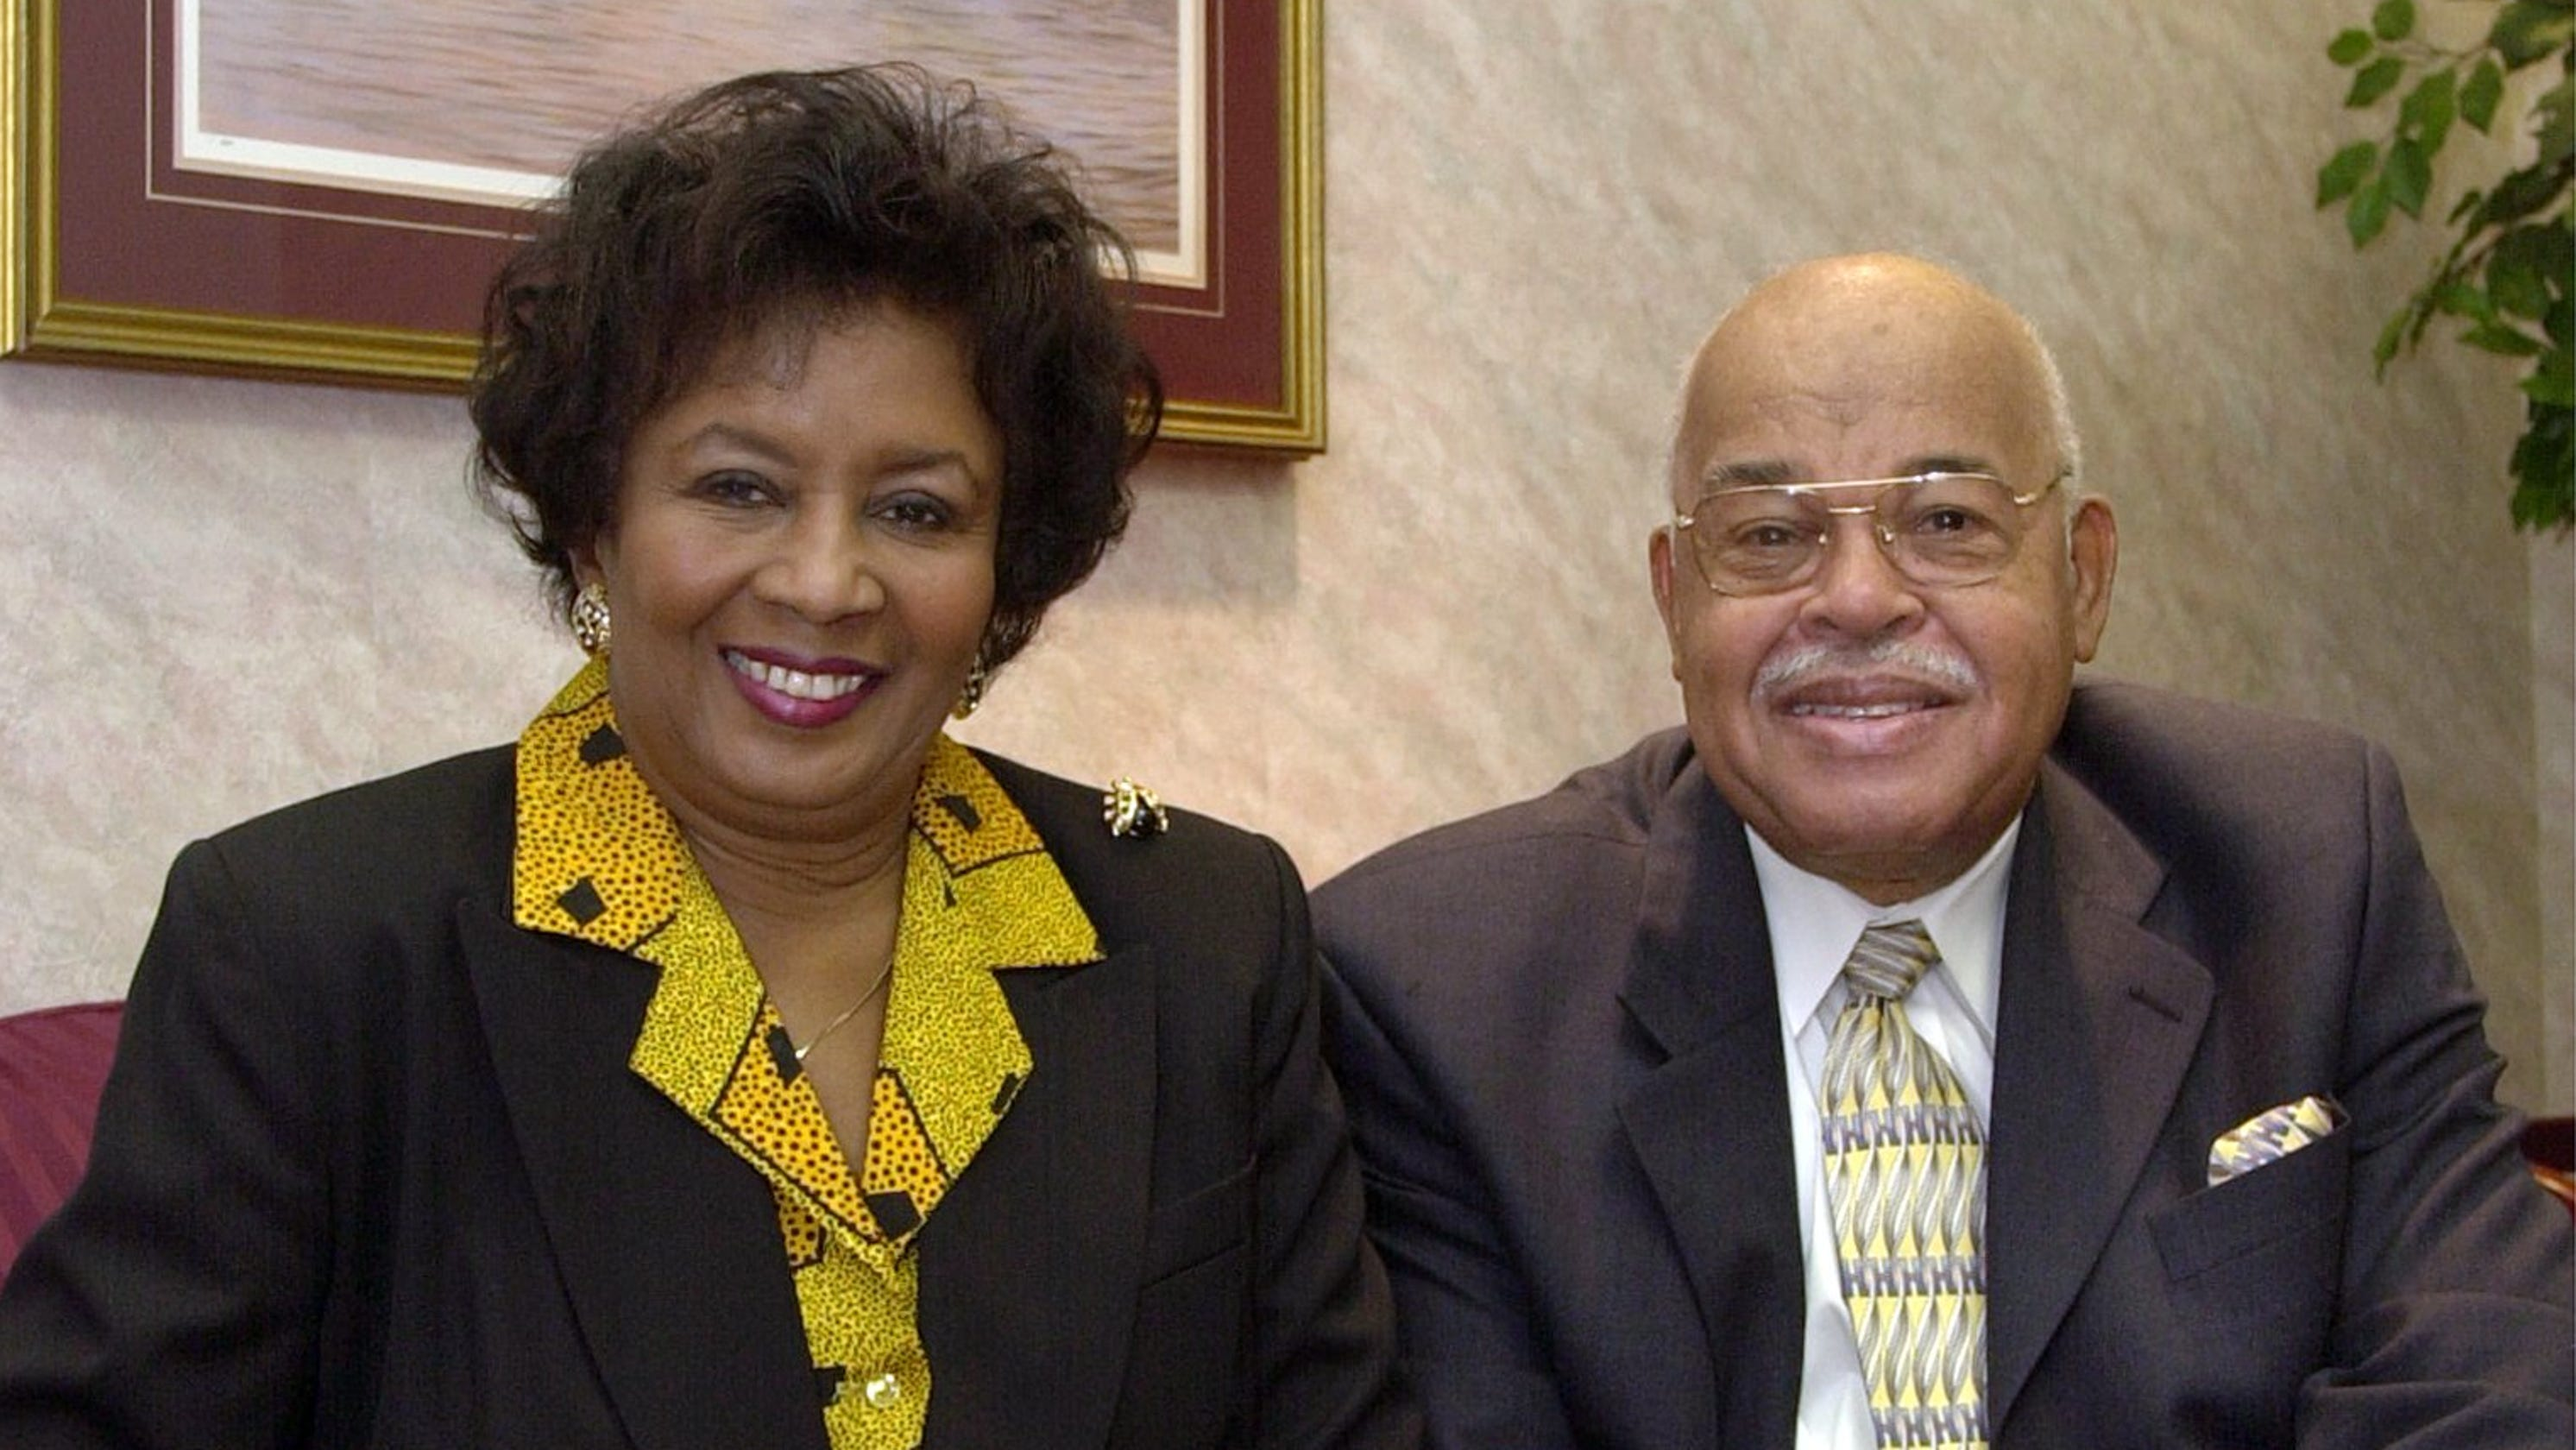 Watkins, Garrett & Woods owner Fred Garrett remembered as